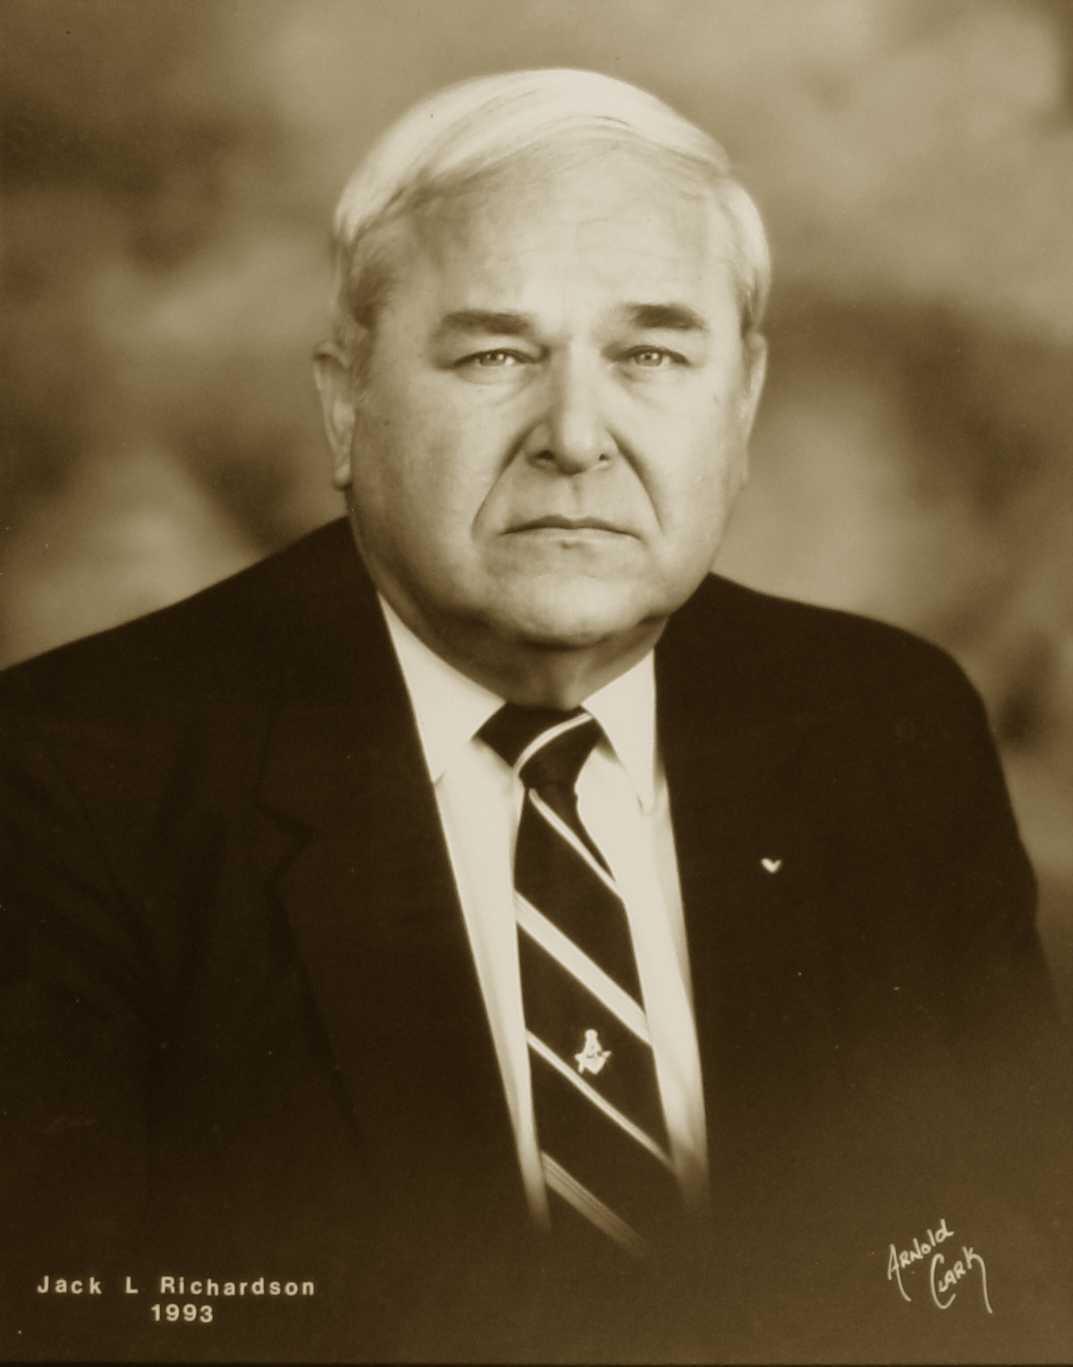 Jack L. Richardson, 1993